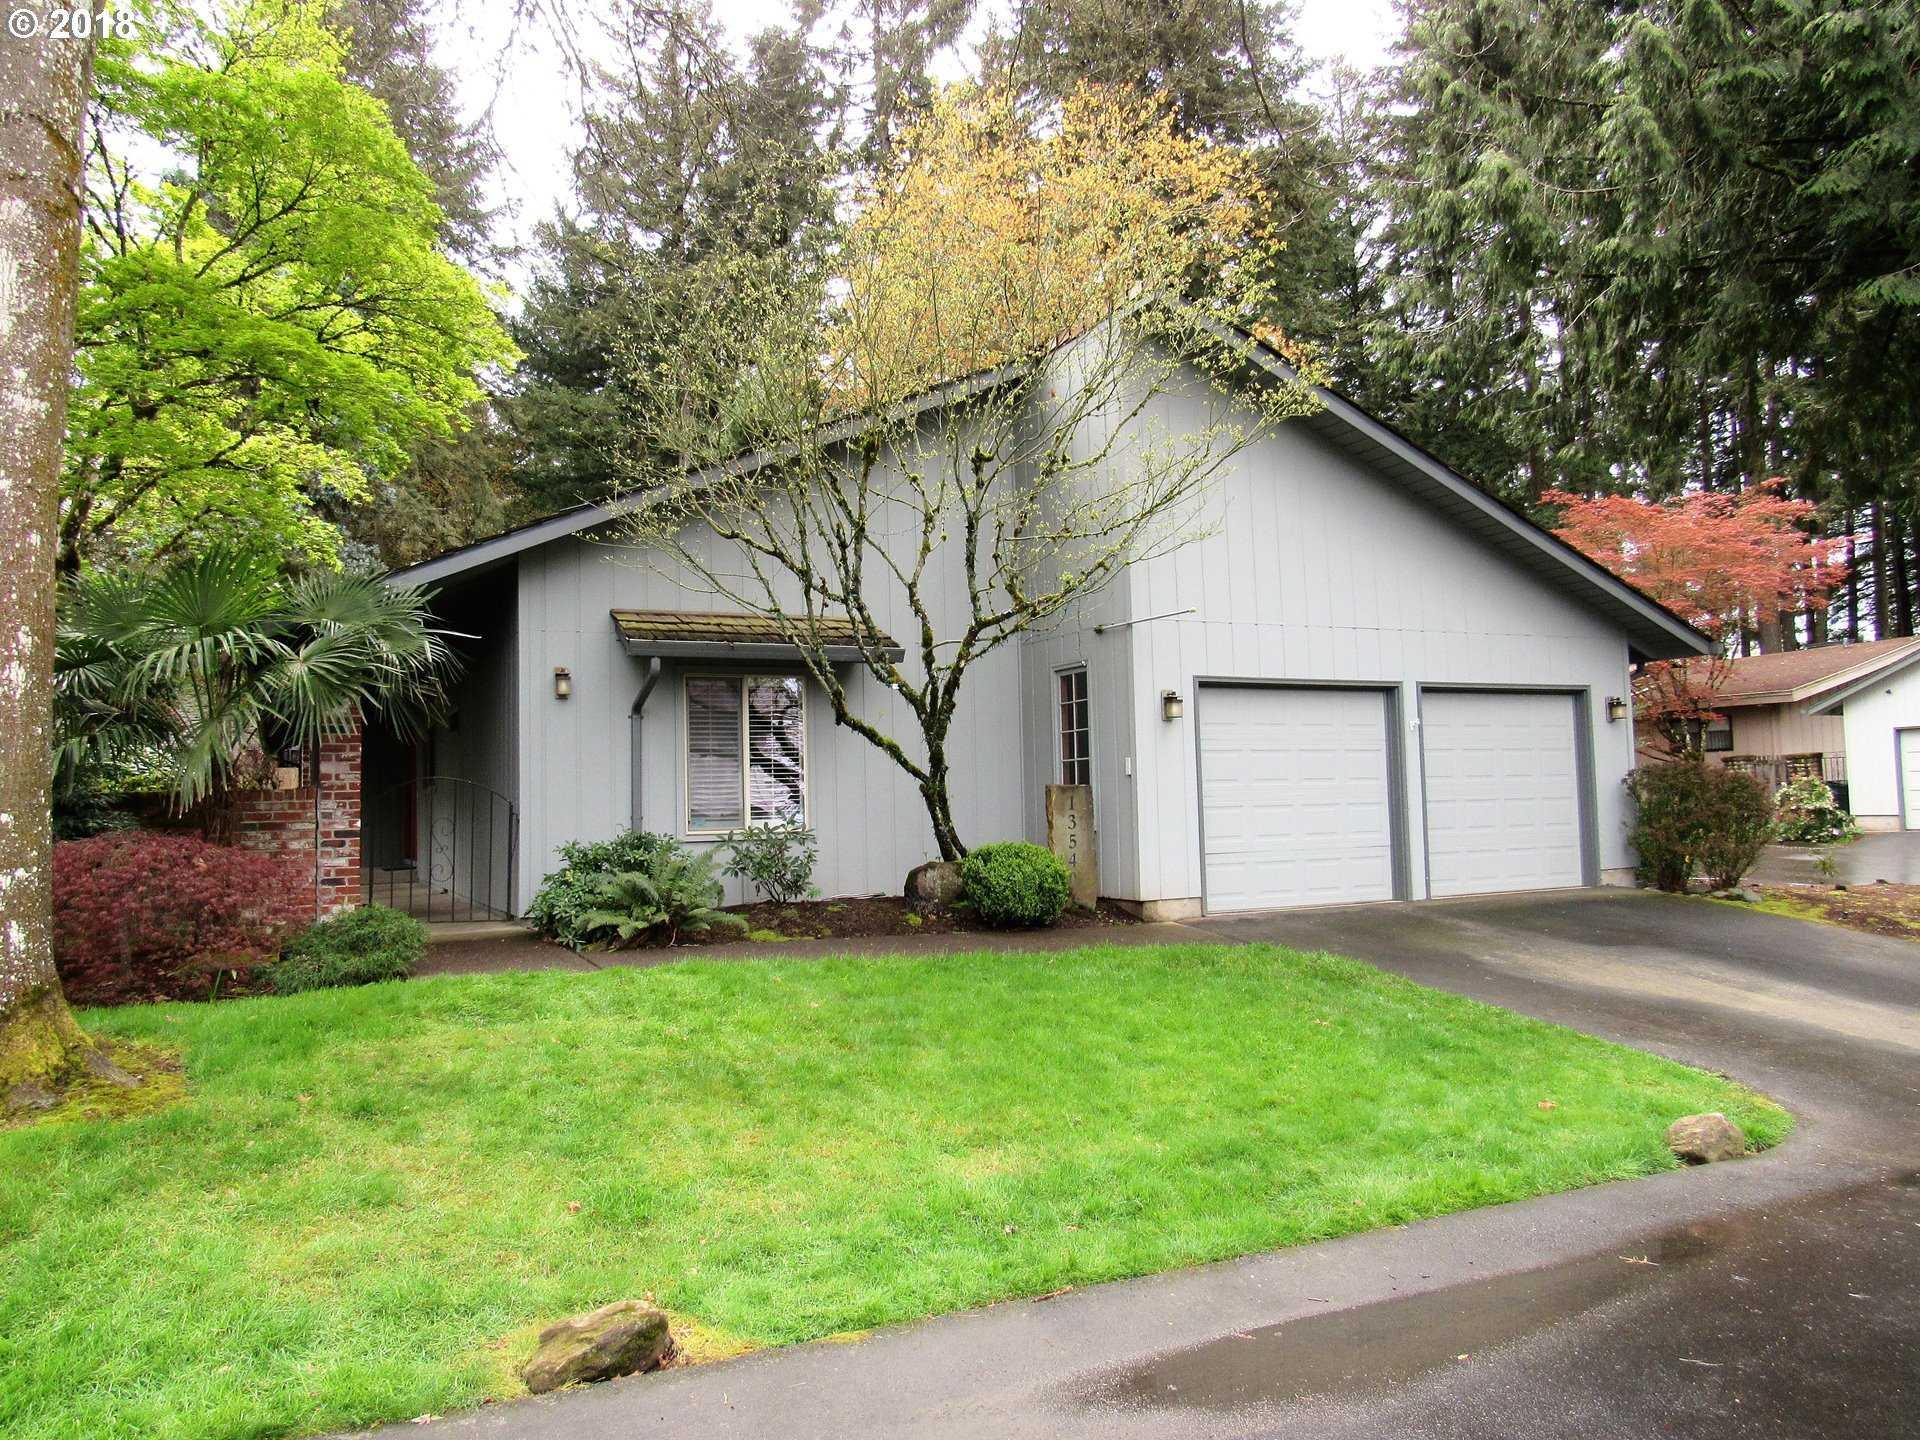 $424,900 - 3Br/2Ba -  for Sale in Beaverton